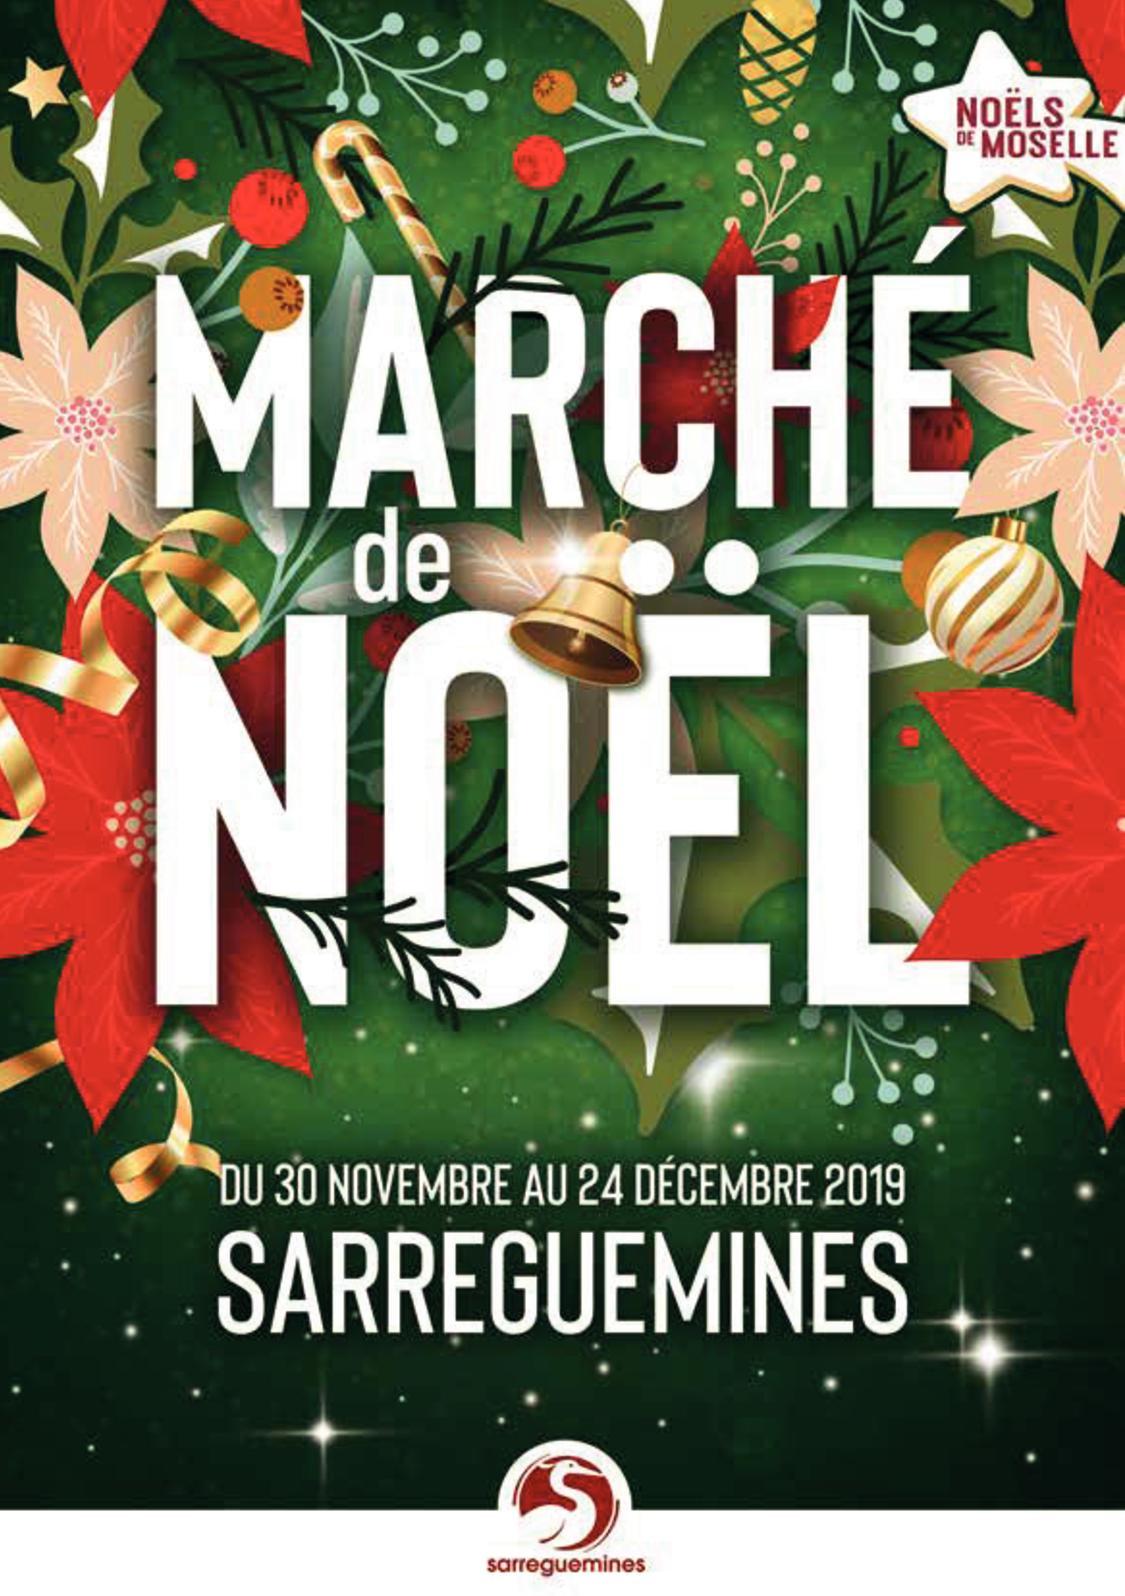 Marché de Noël Sarreguemines 2019 - Programme